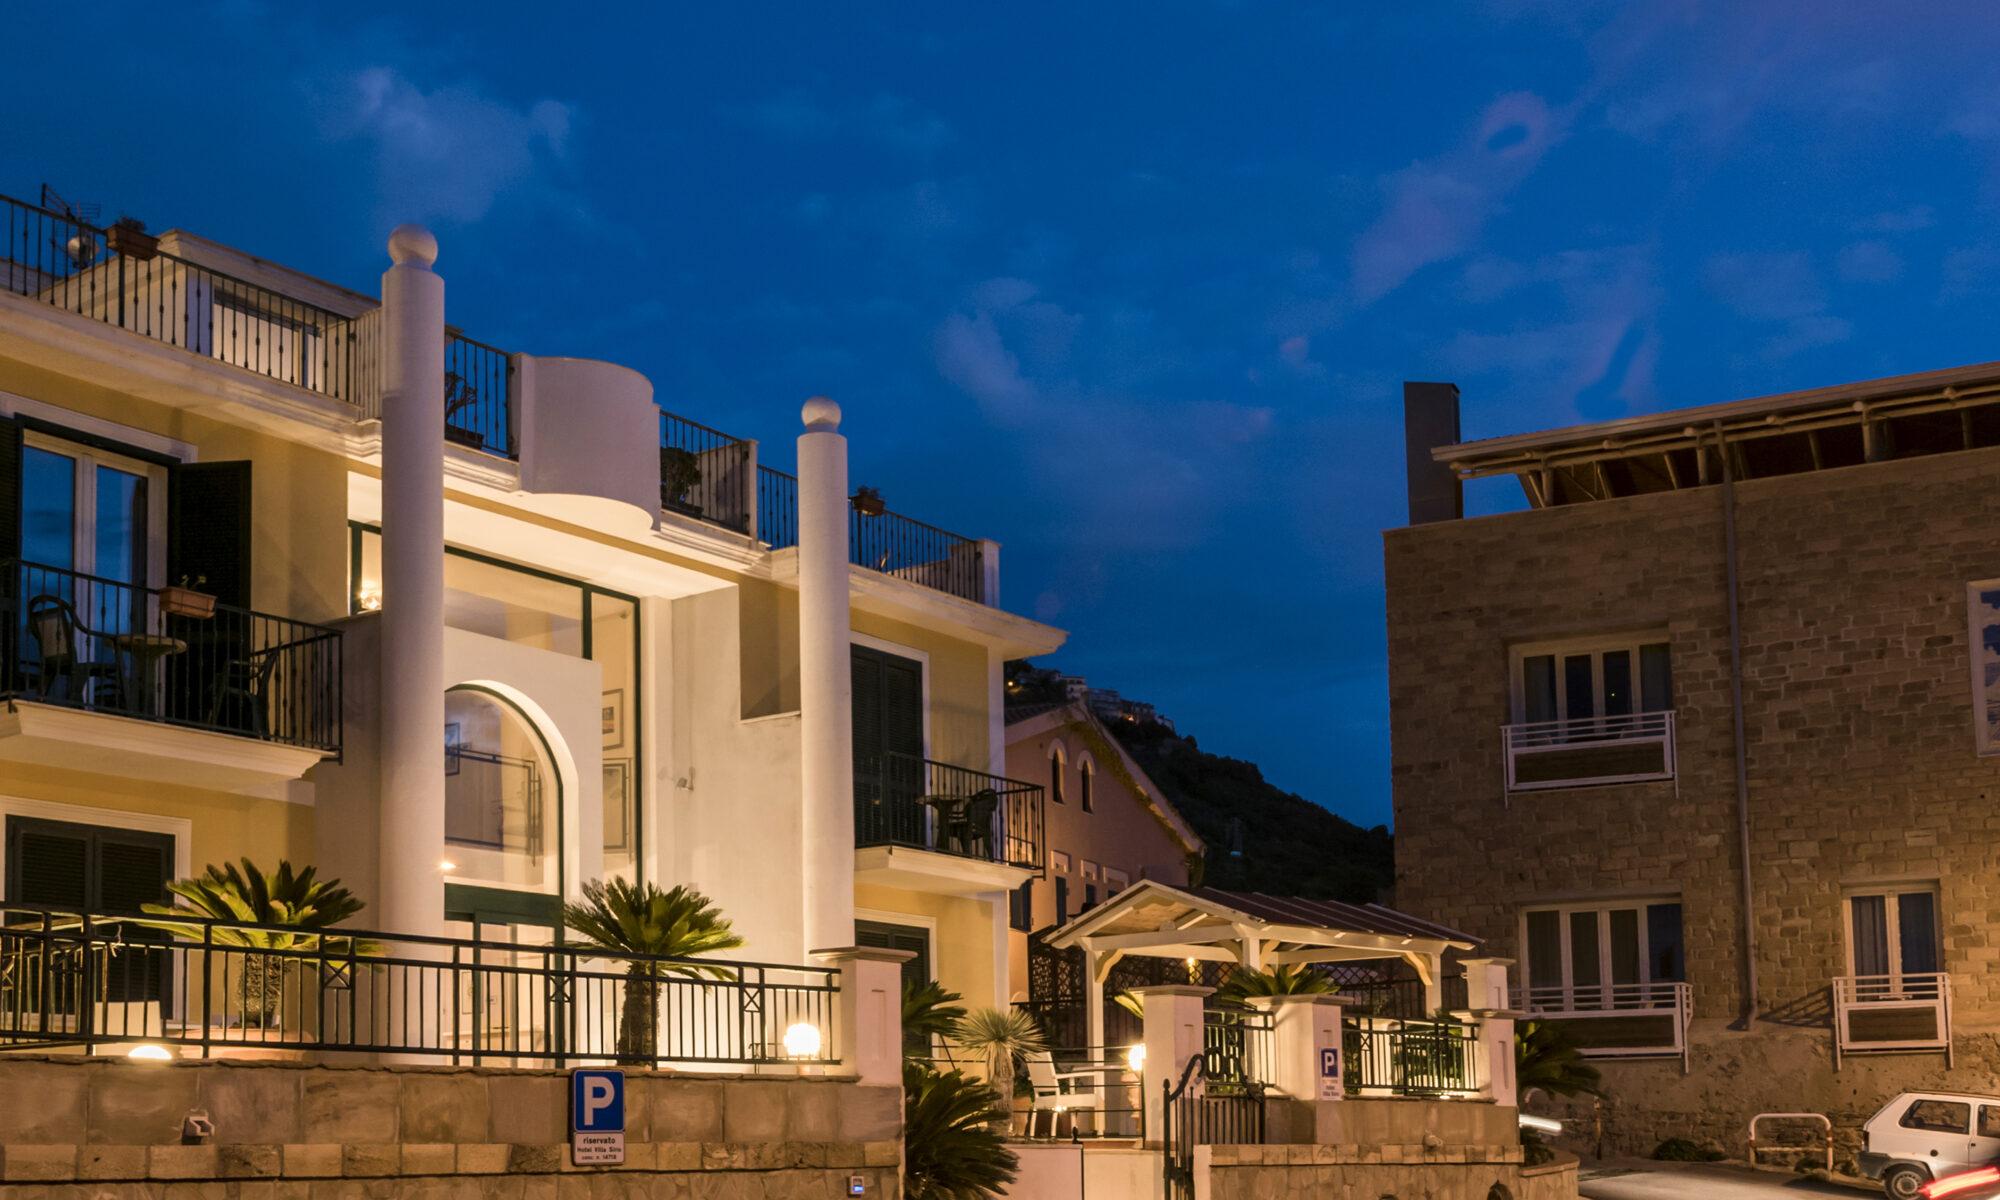 Depandance Hotel Miramare  U2013 Hotel Villa Sirio